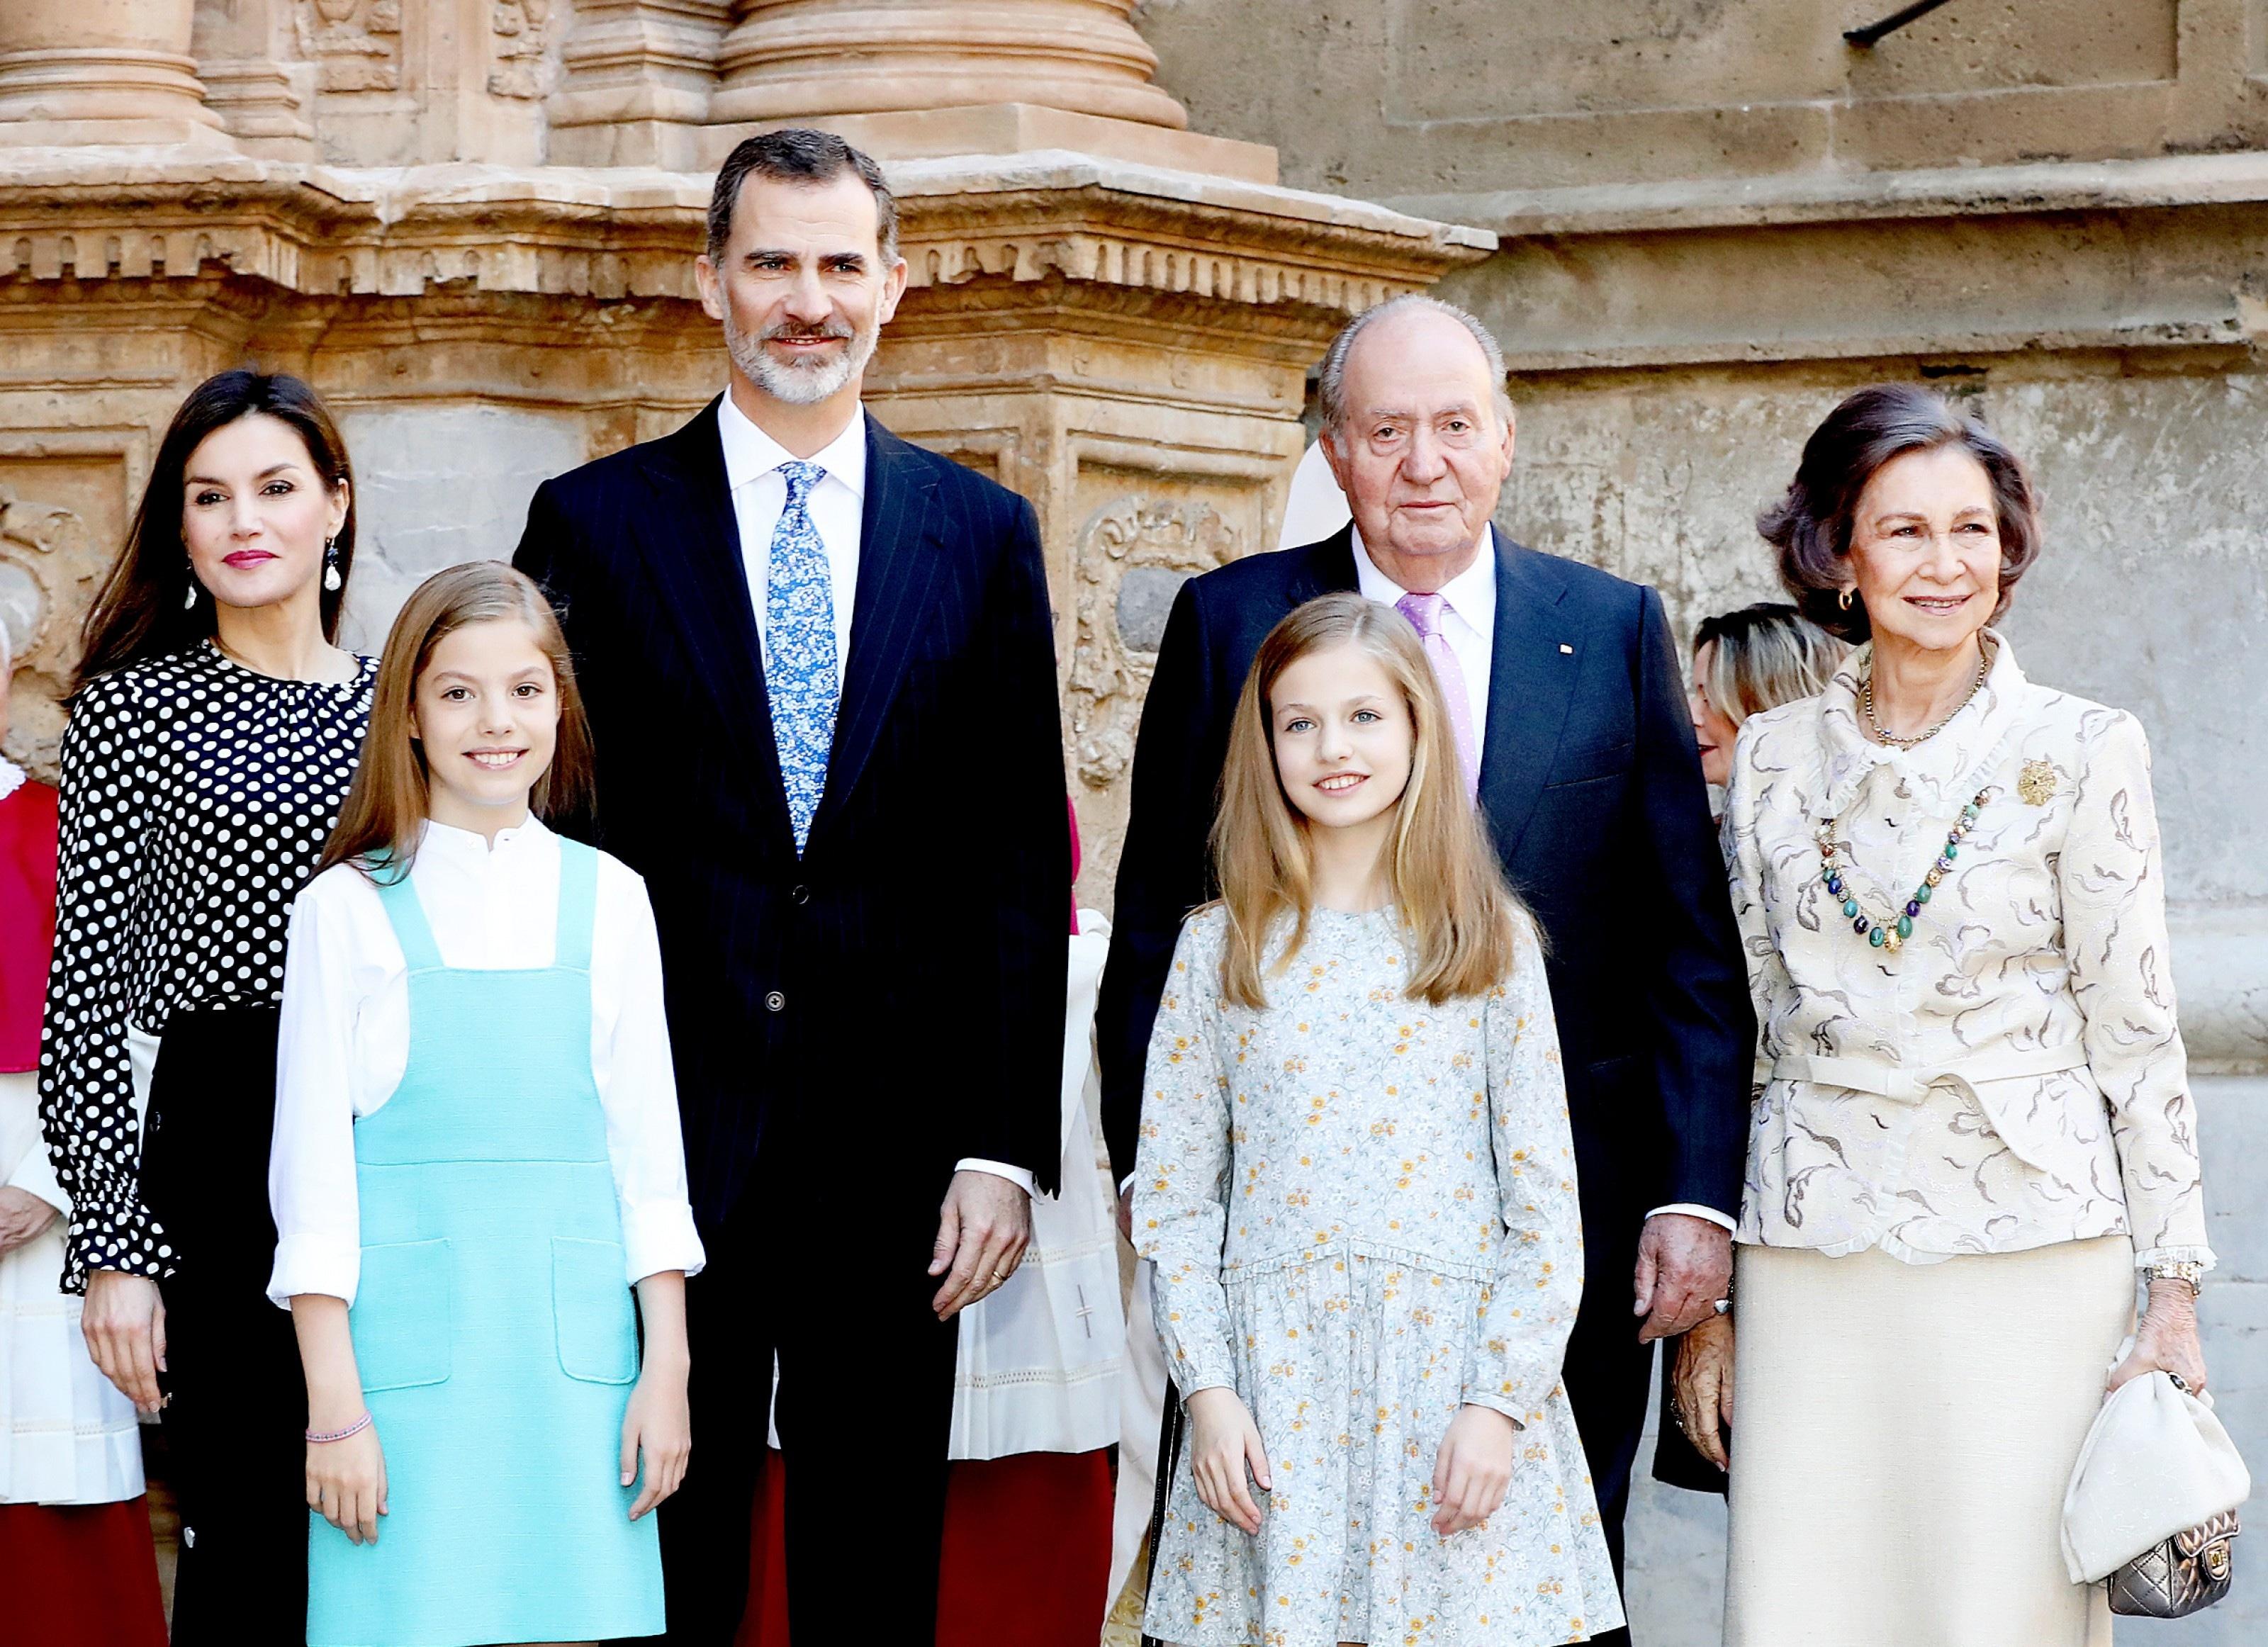 Letizia, principe Felipe, rey Juan Carlos I, reina Sofía